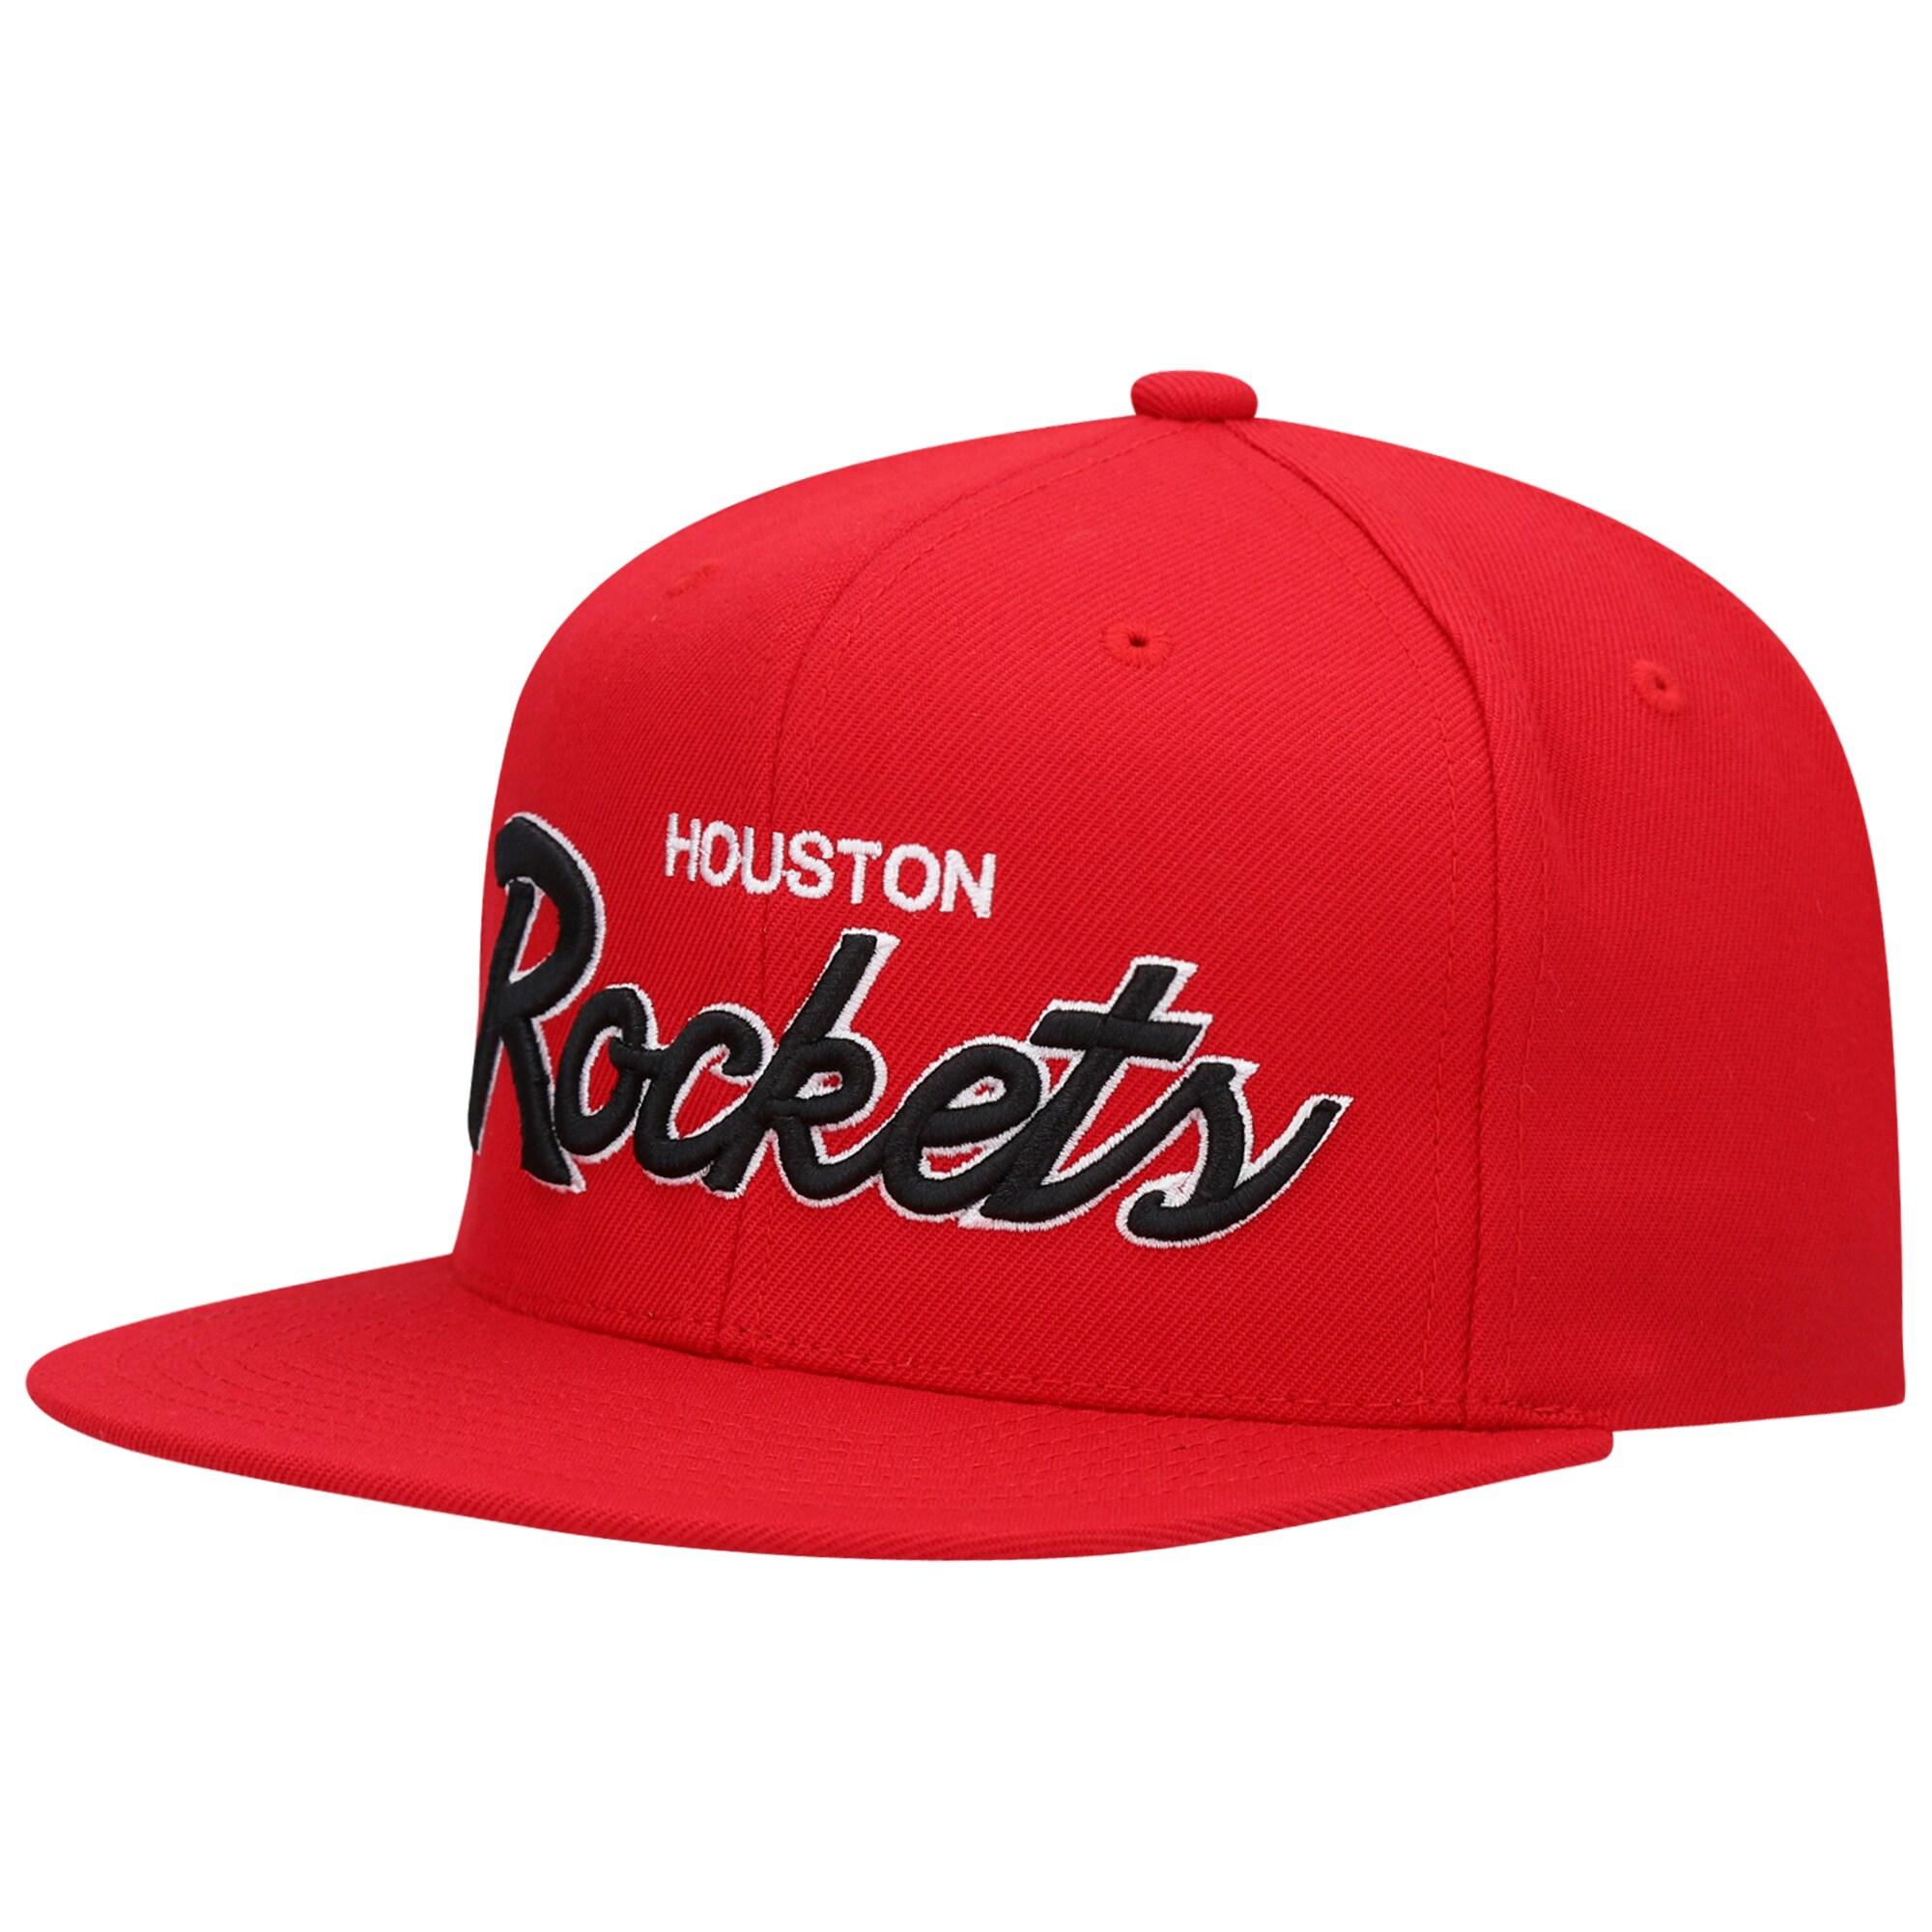 Houston Rockets Mitchell & Ness 2020 Playoffs Script Snapback Hat - Red